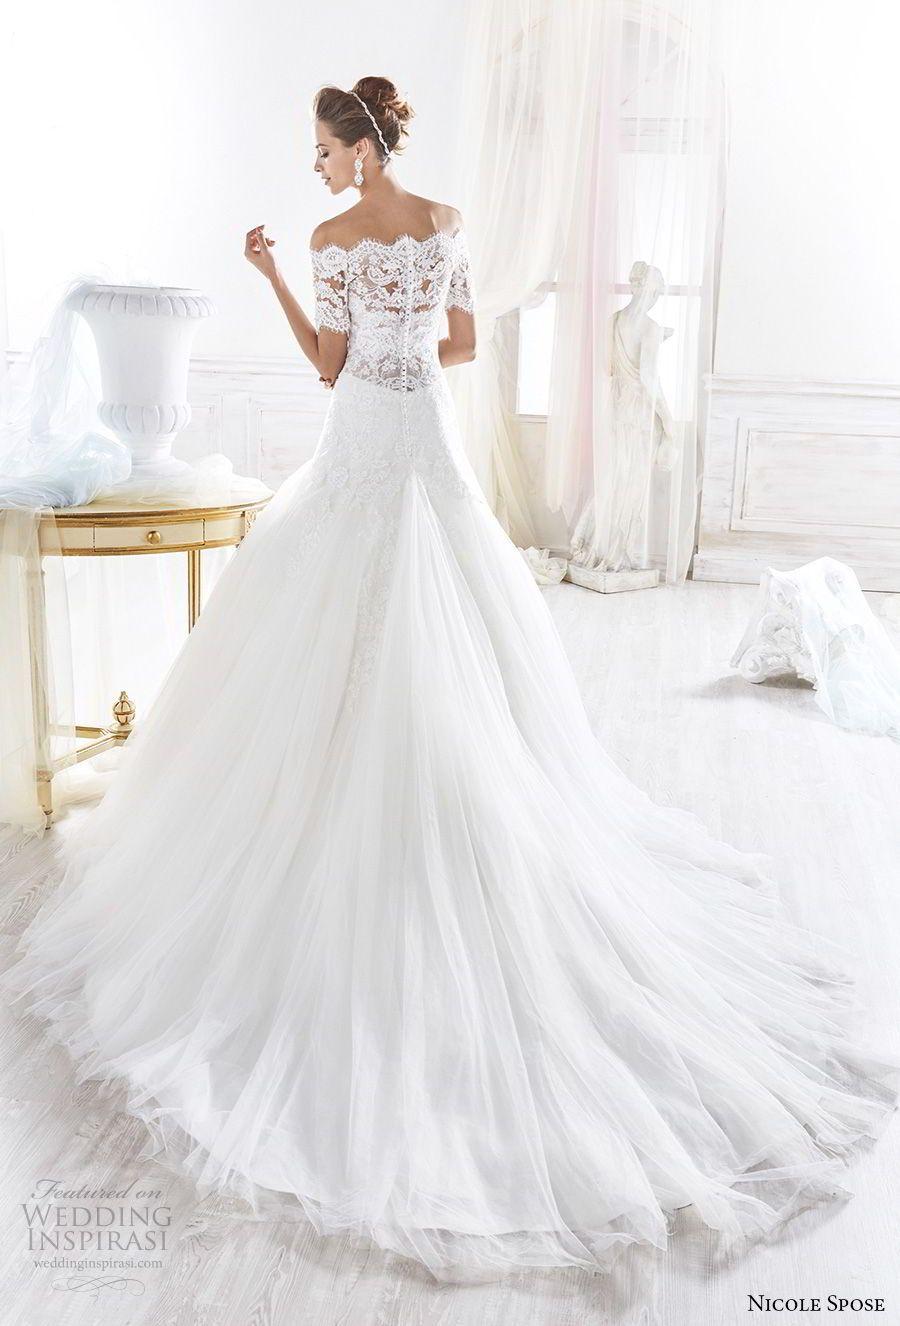 Nicole 2018 Bridal Collection Princess Ready Wedding Dresses Wedding Inspirasi Wedding Dress Accessories A Line Wedding Dress Sheer Wedding Dress [ 1326 x 900 Pixel ]